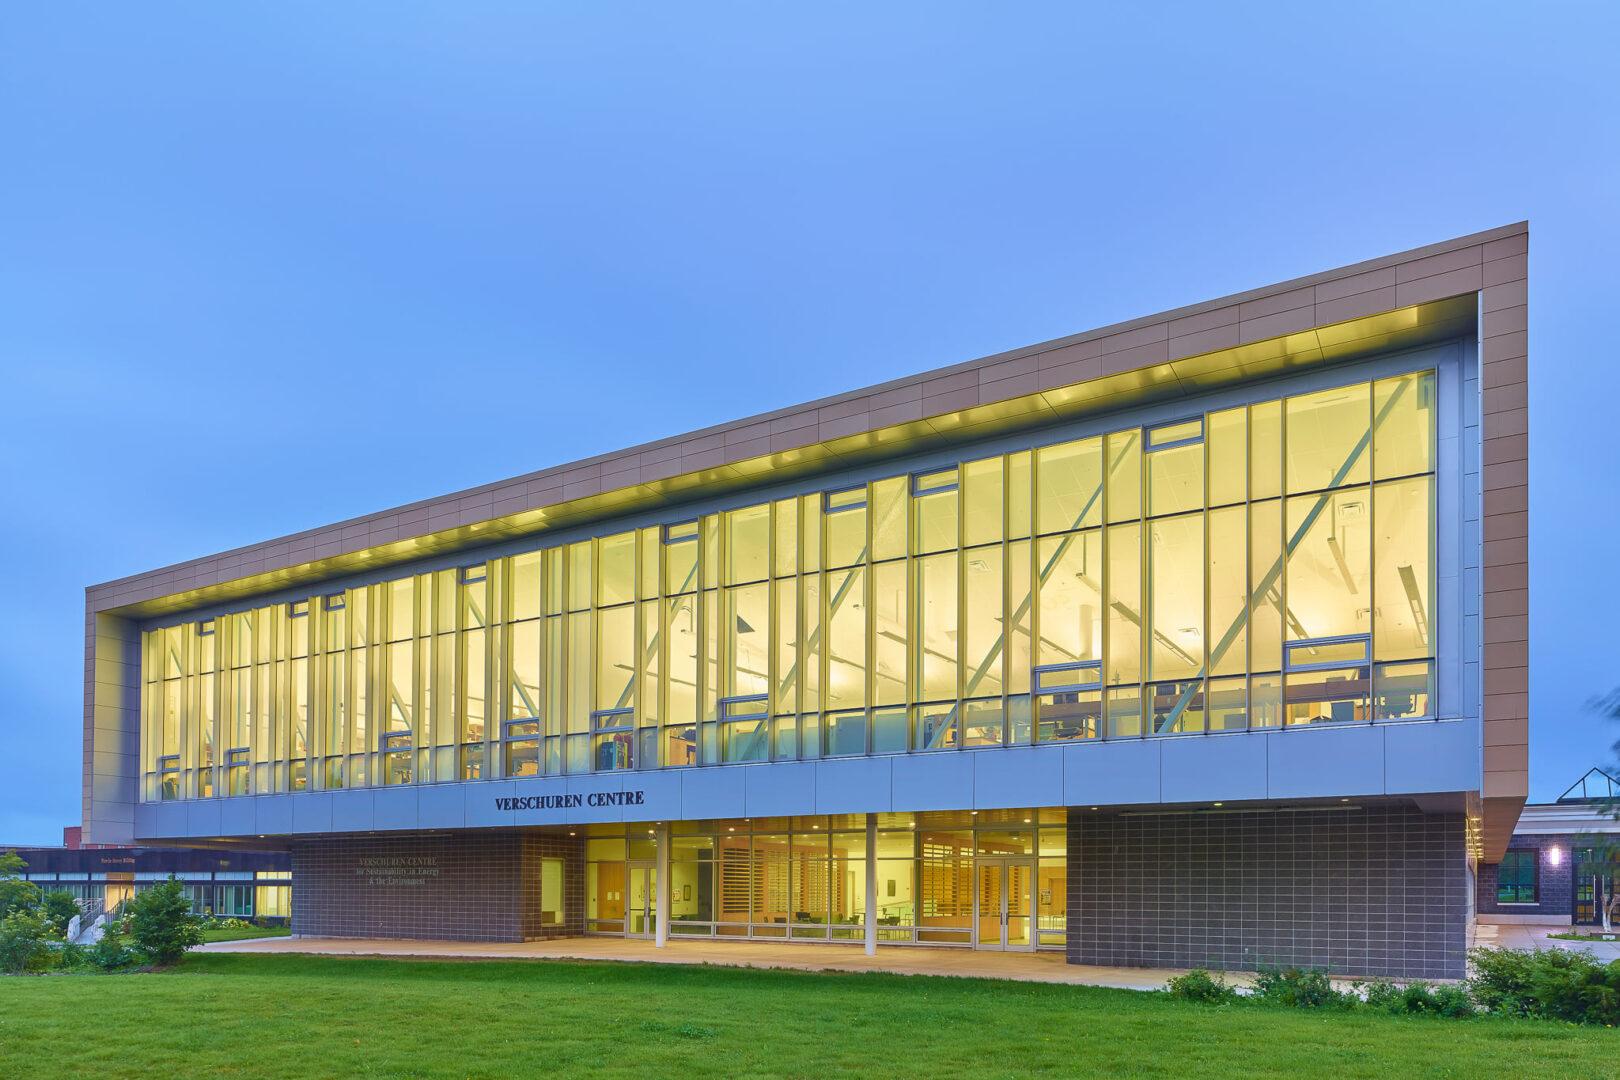 International Centre for EAP - Cape Breton University Campus Gallery